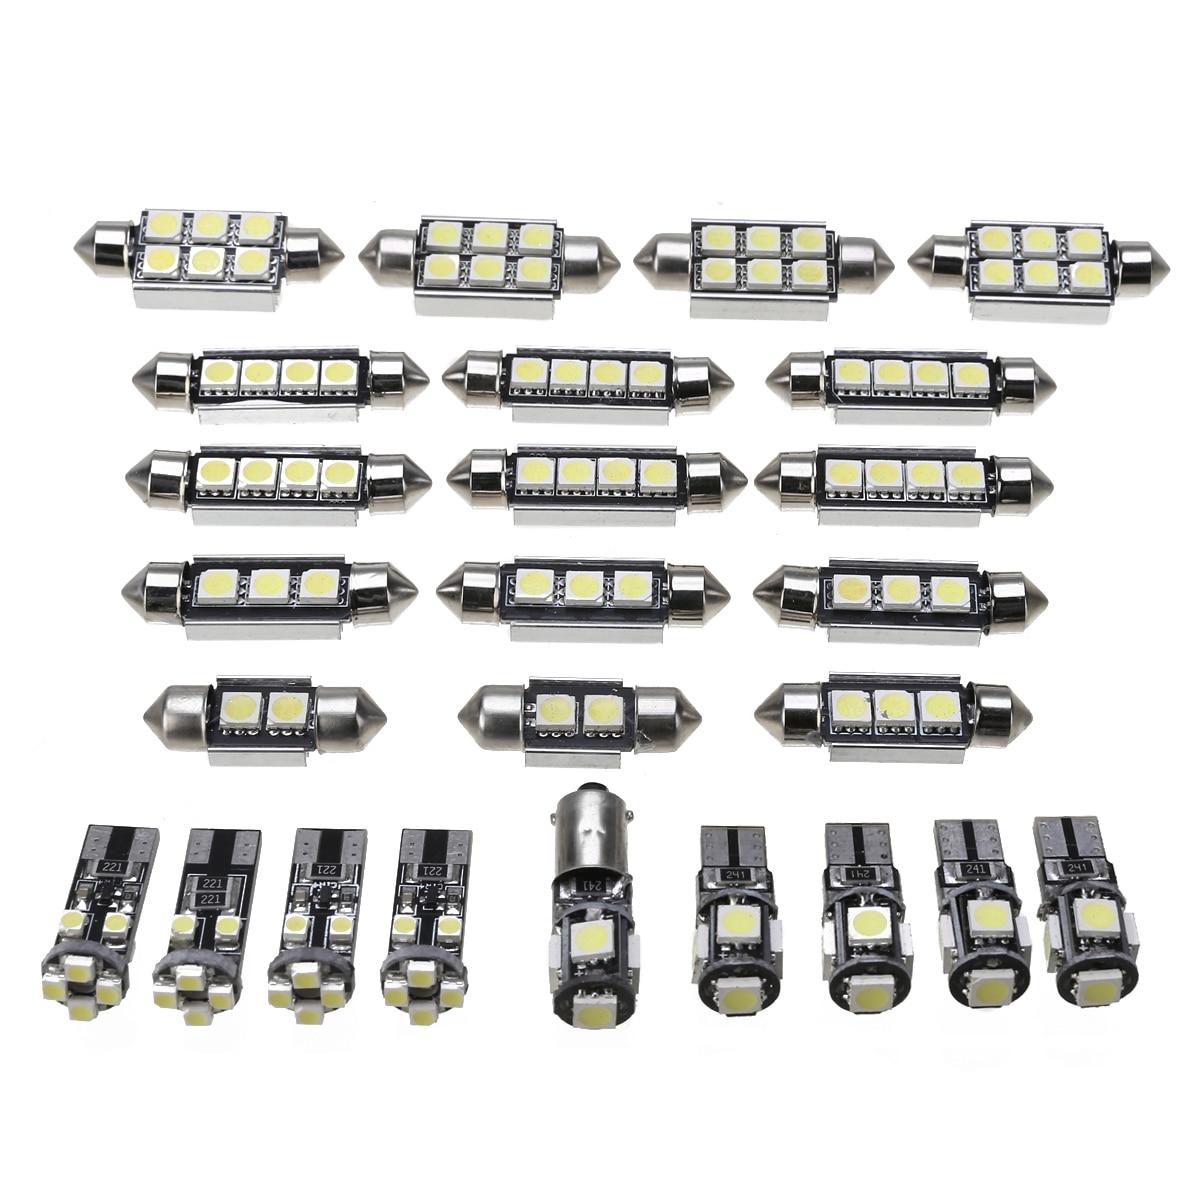 25 stücke 12V T10 BA9S 5050 Girlande Licht Auto LED Innenraum Lampe Leuchtet Bulbs Kit Für BMW X5 E70 M 2007-2013